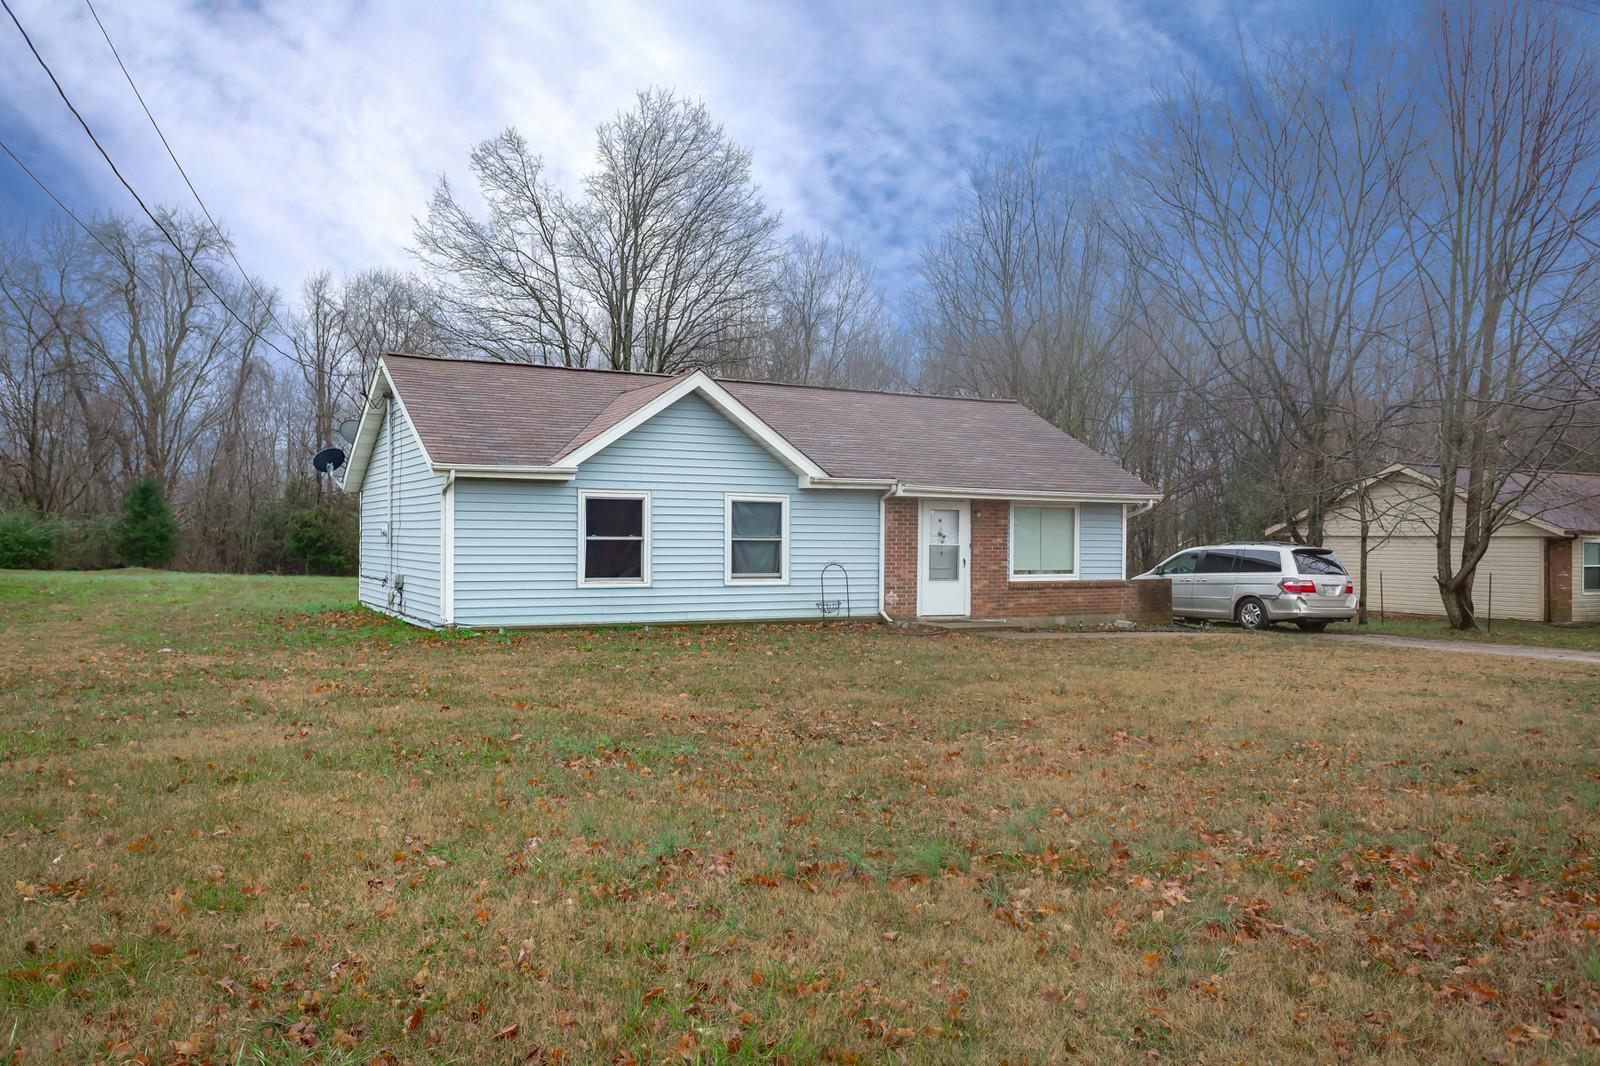 224 State Line Rd, Clarksville, TN 37042 - Clarksville, TN real estate listing